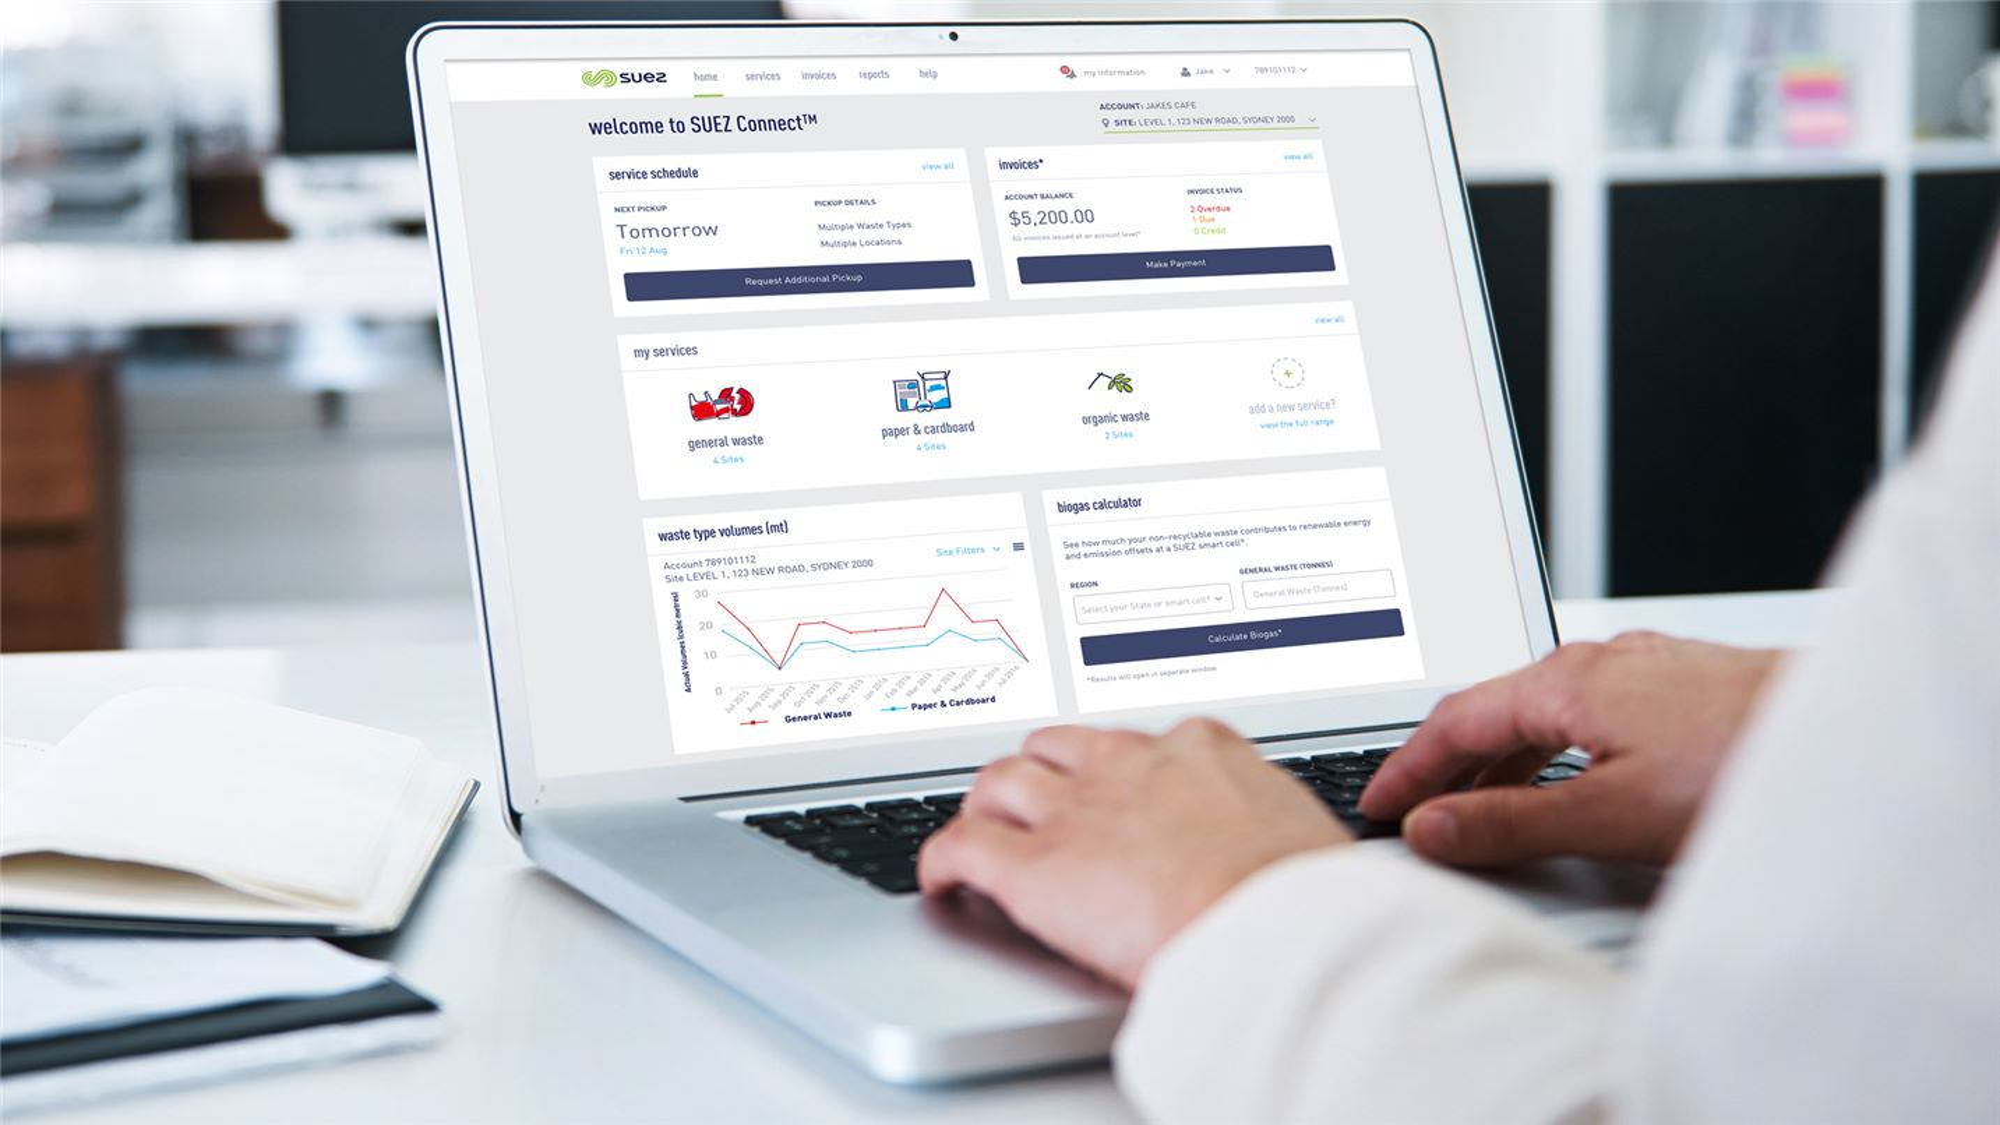 SUEZ customer portal header image. Image of laptop screen showing SUEZ connect portal.